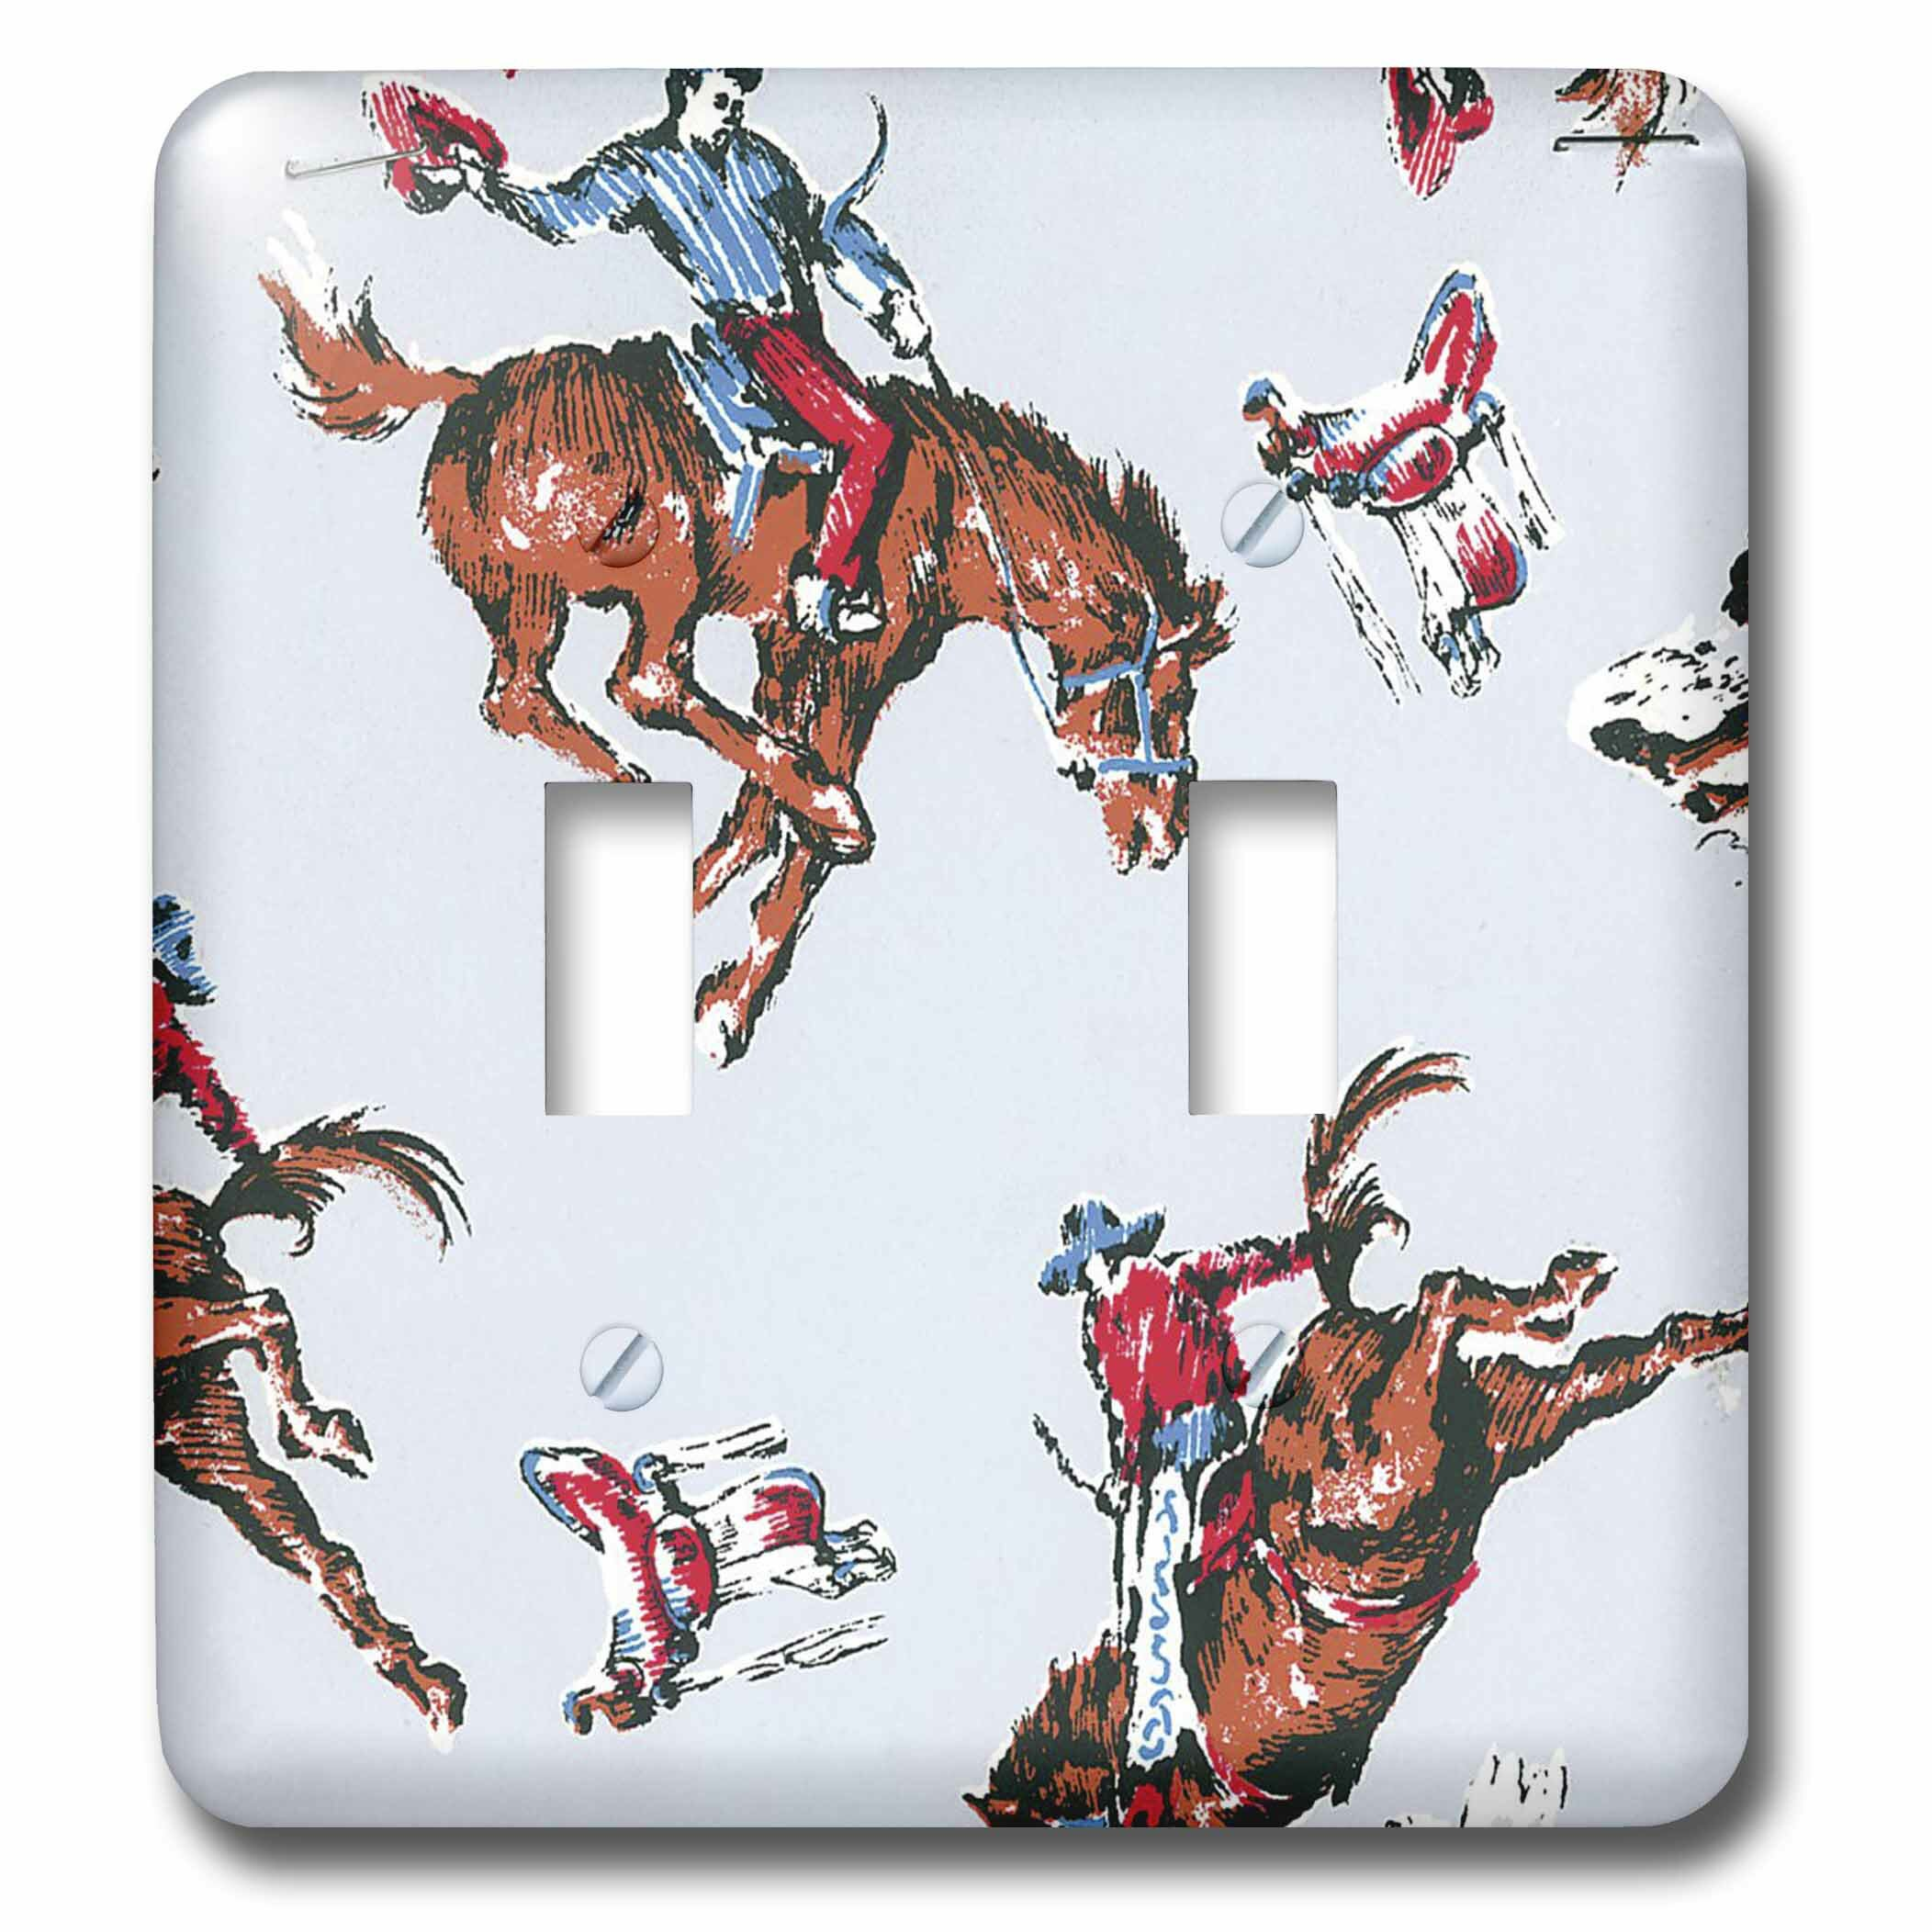 3drose Rodeo Cowboys 2 Gang Toggle Light Switch Wall Plate Wayfair